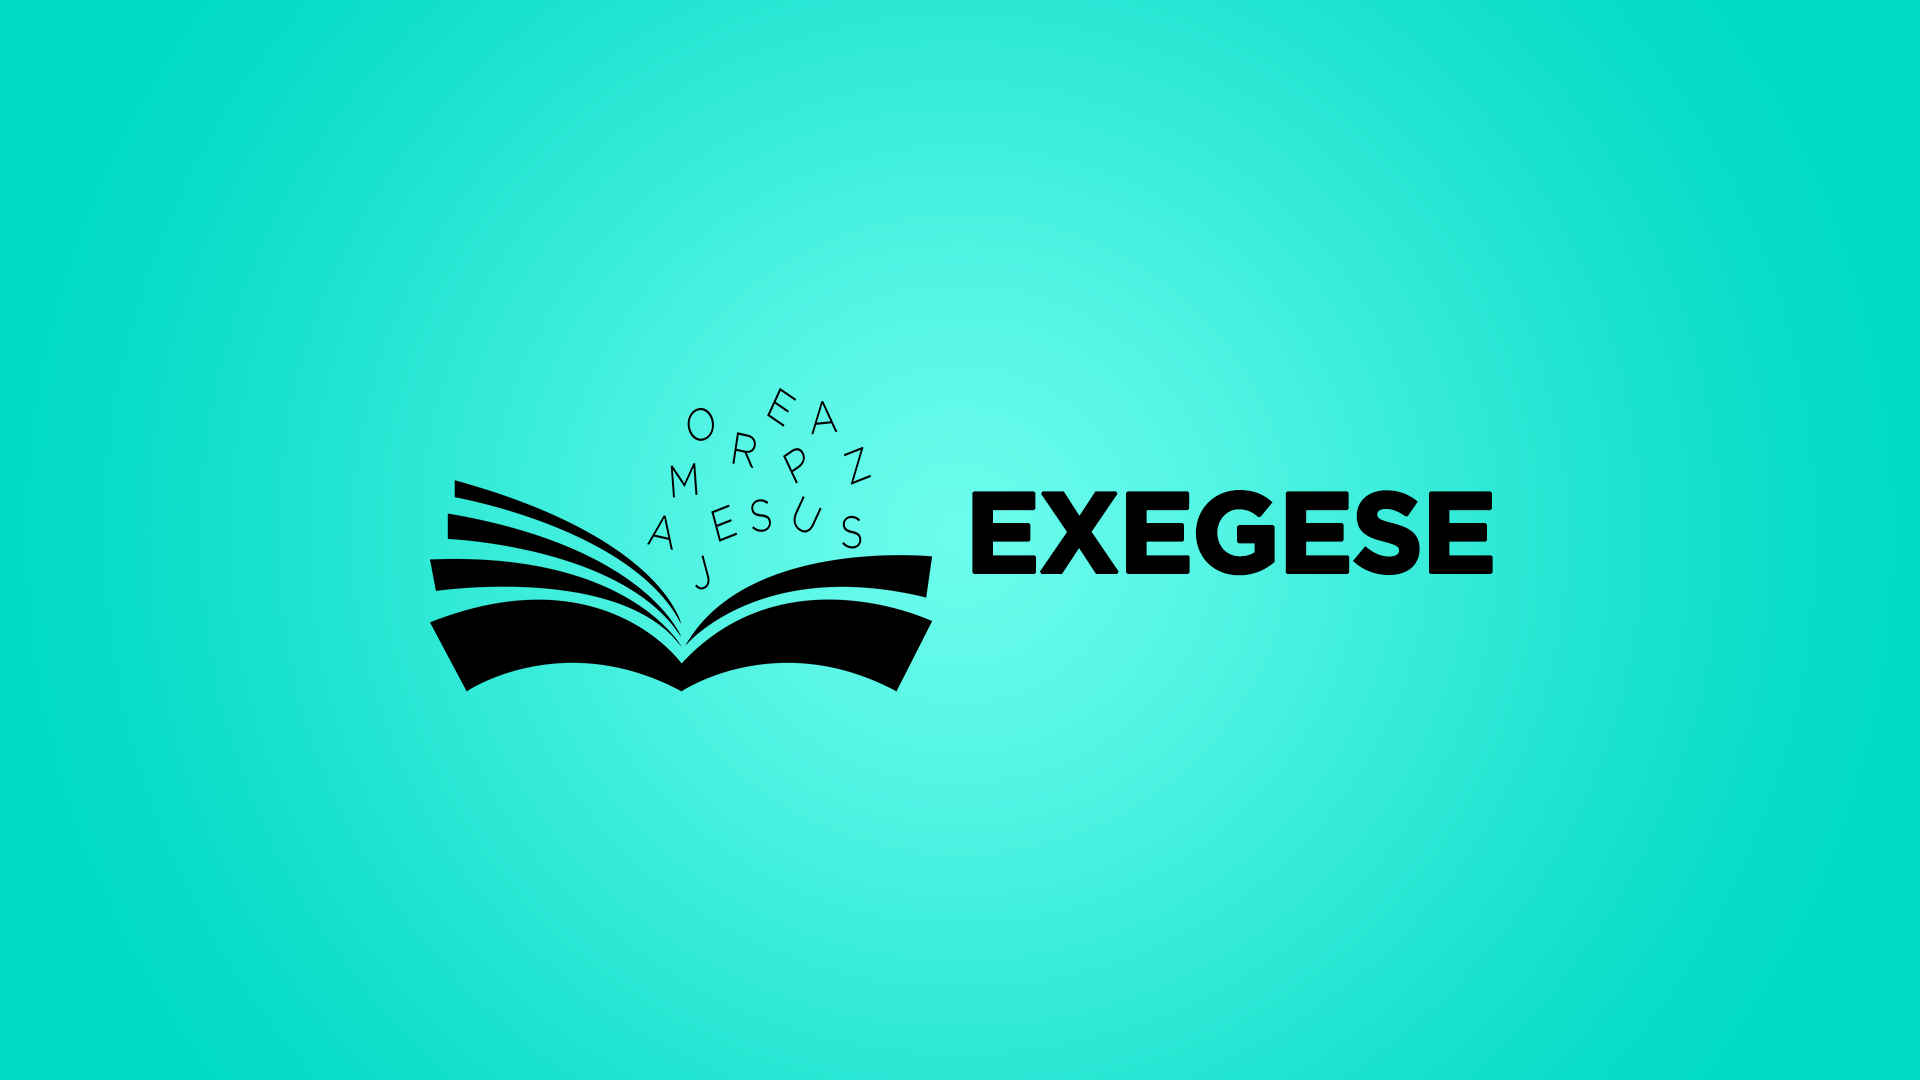 Exegese black